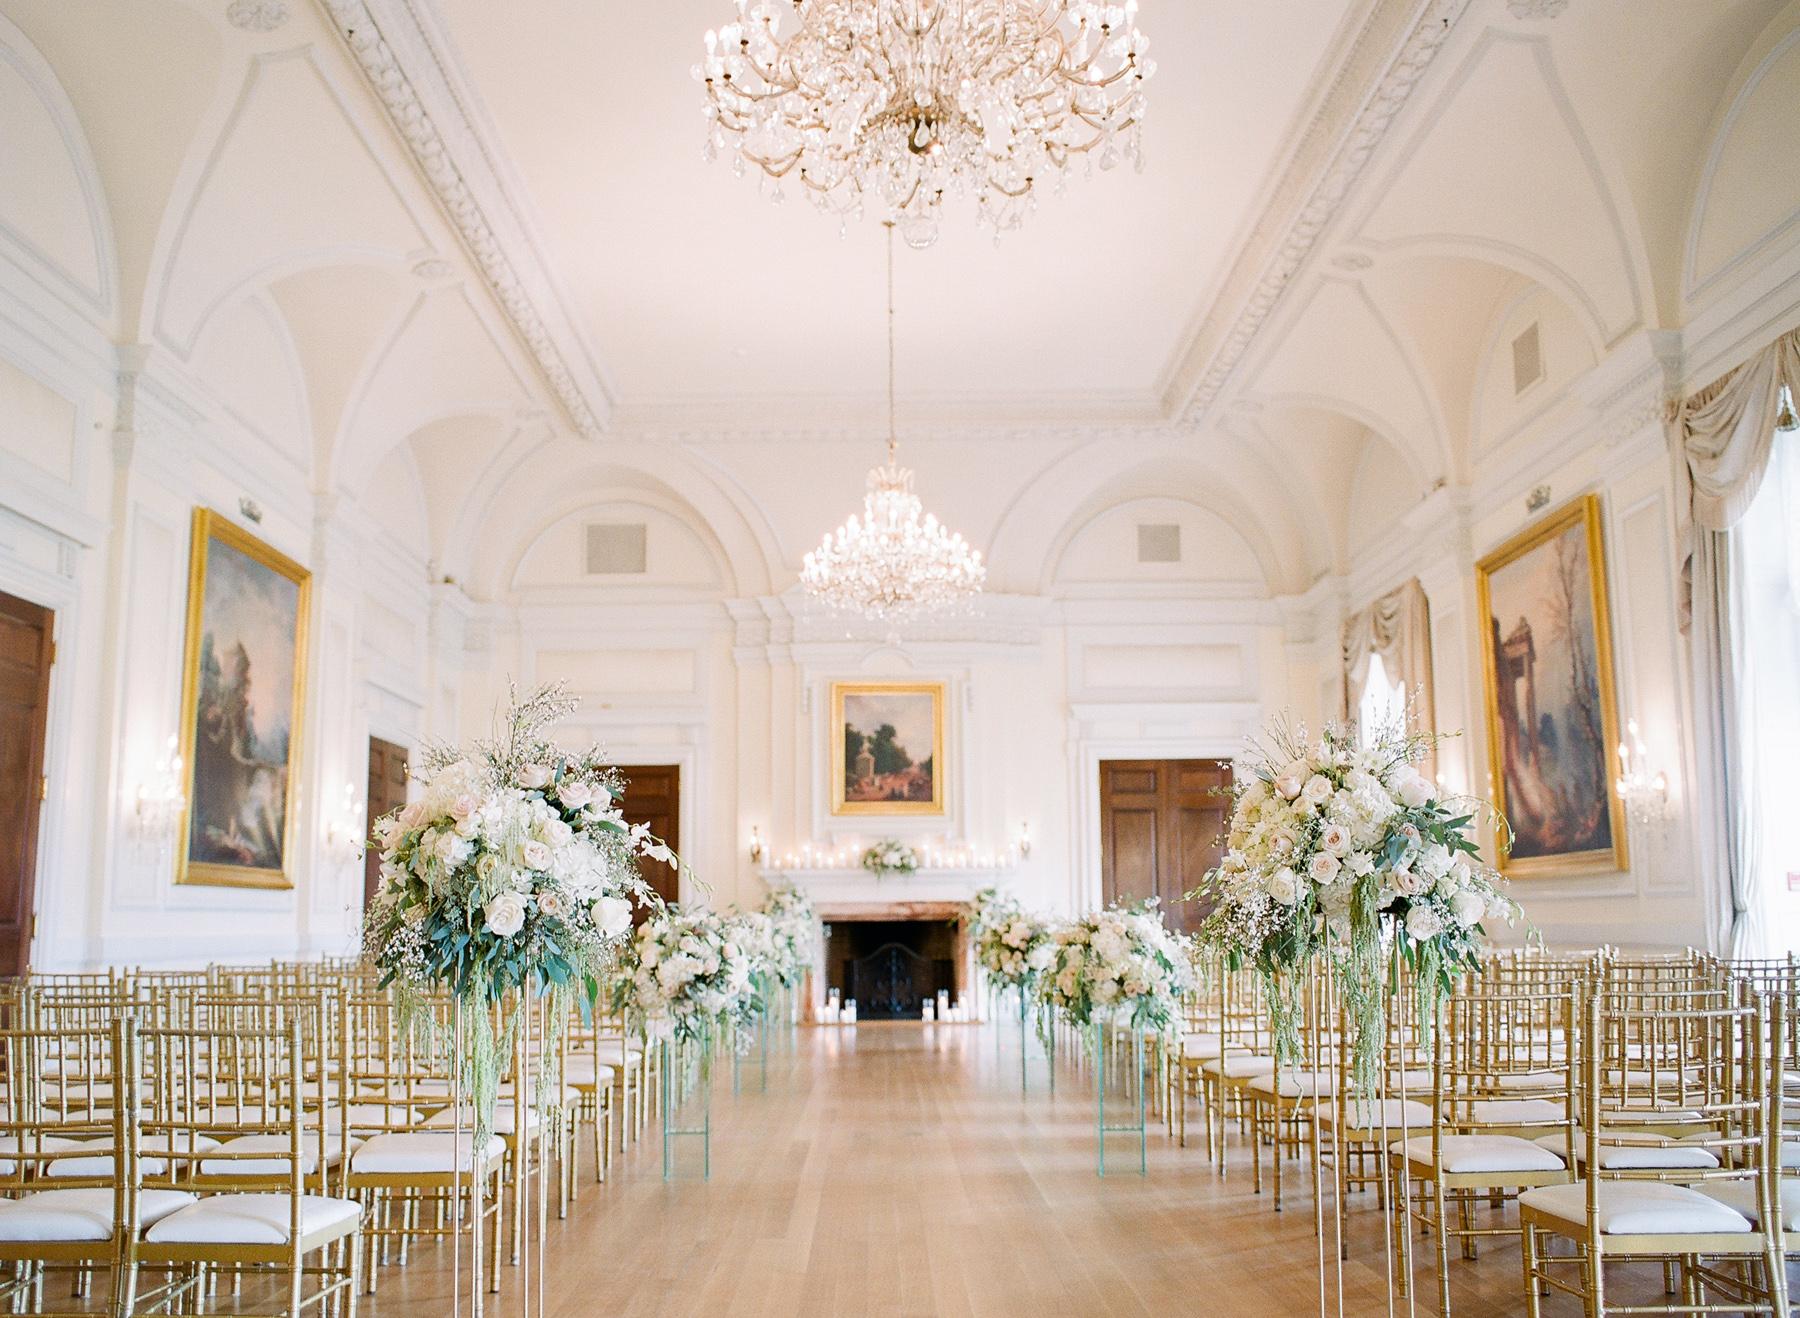 Brian-McKnight-wedding-oheka-castle-053.jpg